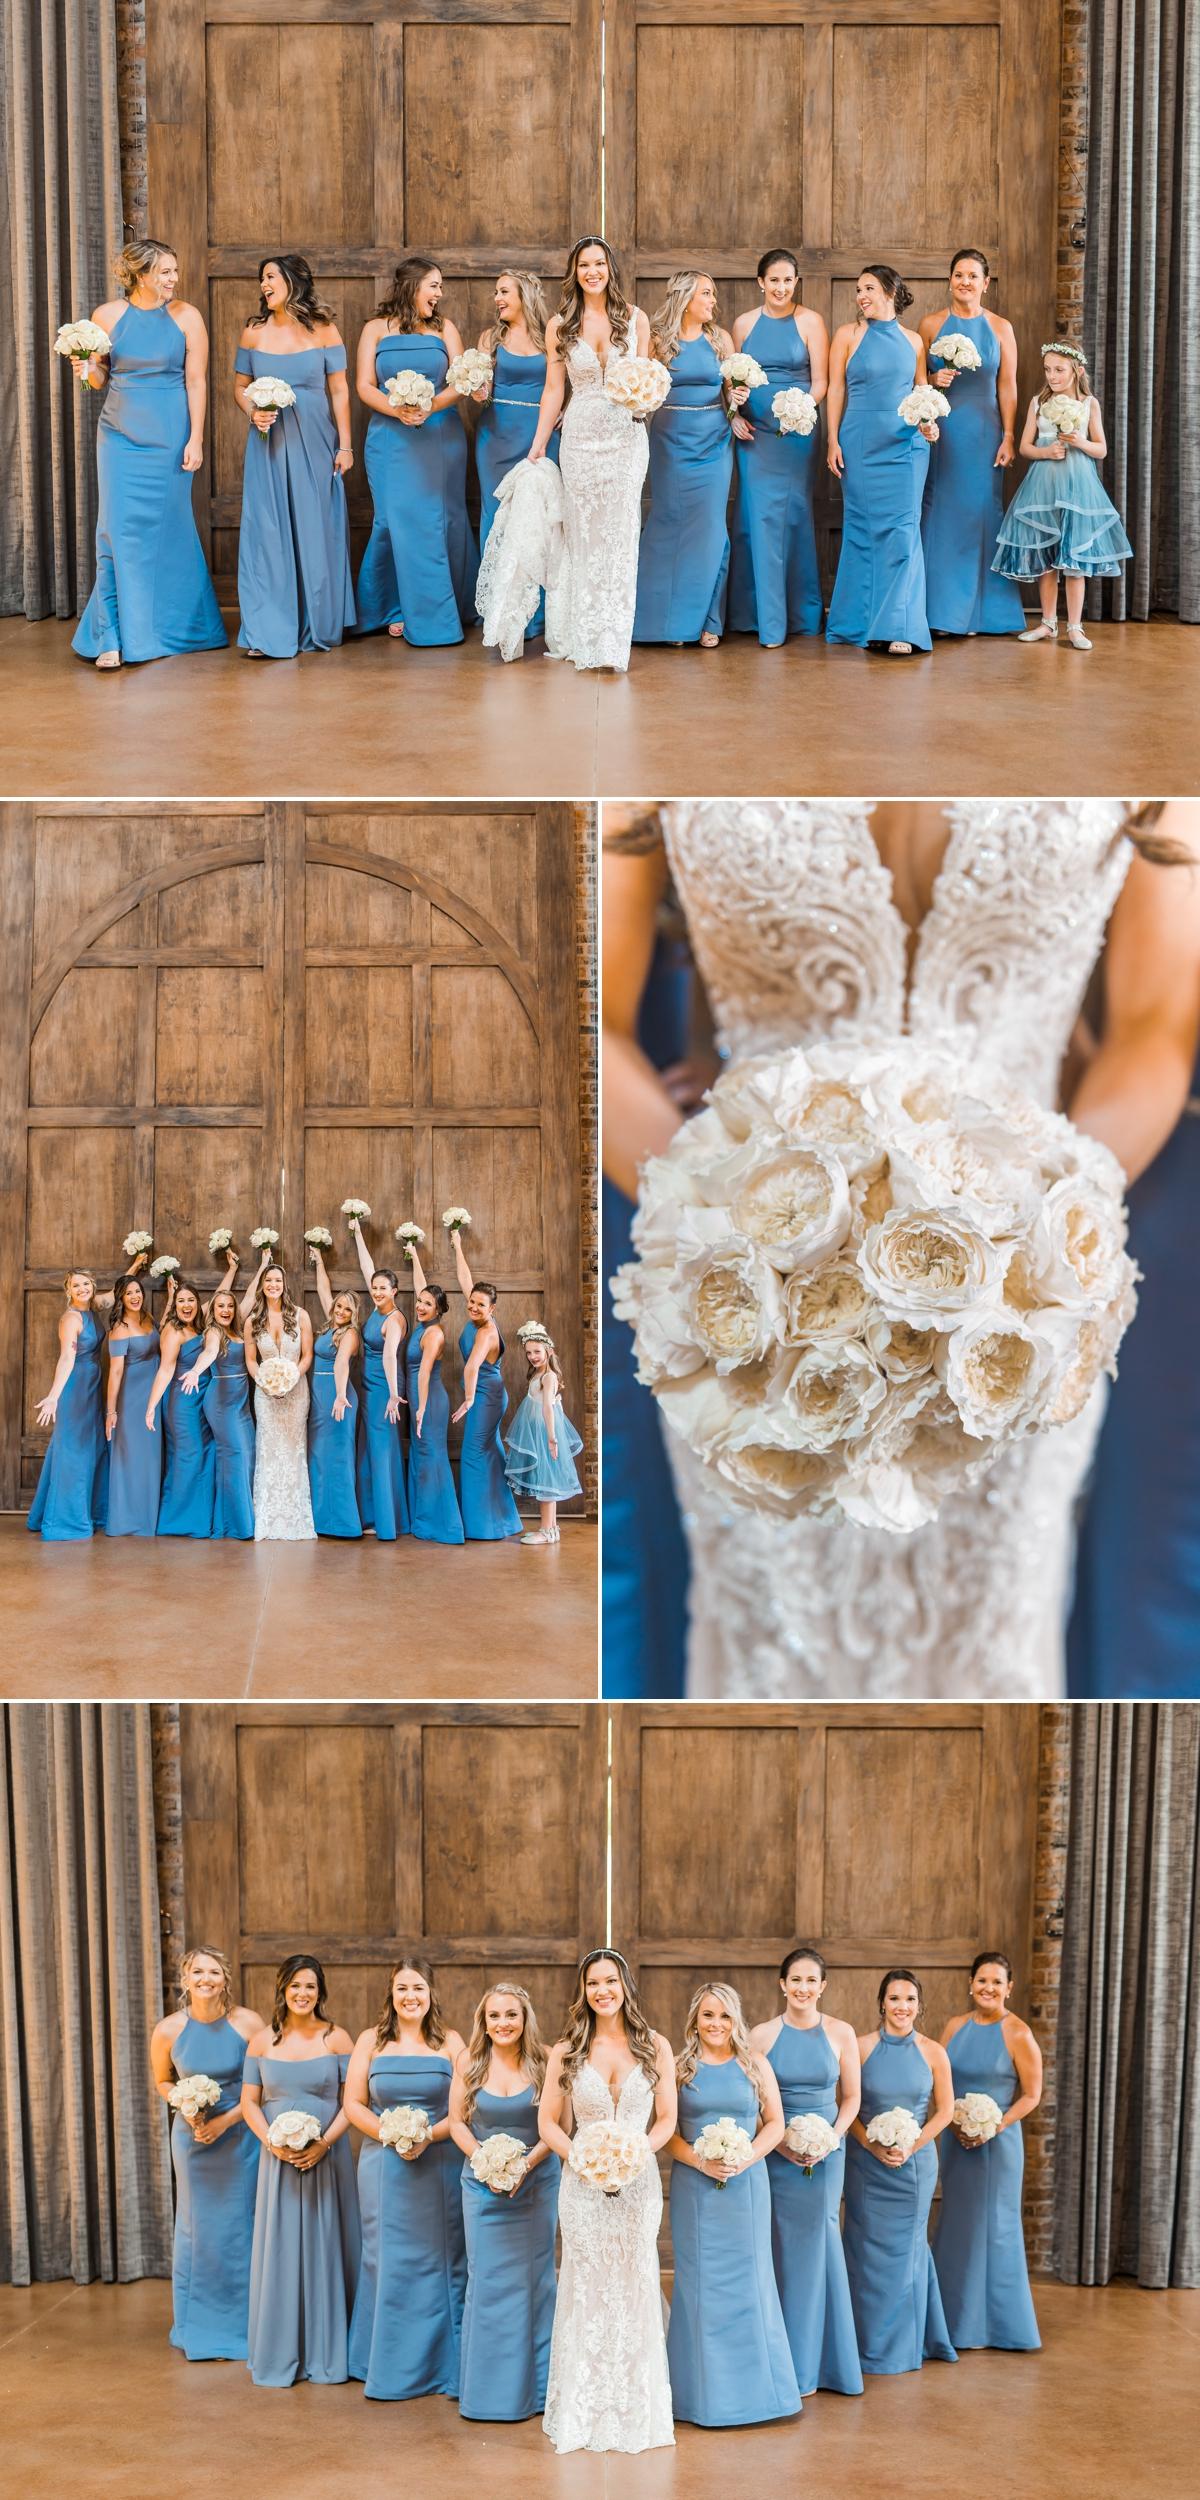 Bride and Bridesmaid Portraits at Iron Manor Wedding in Houston